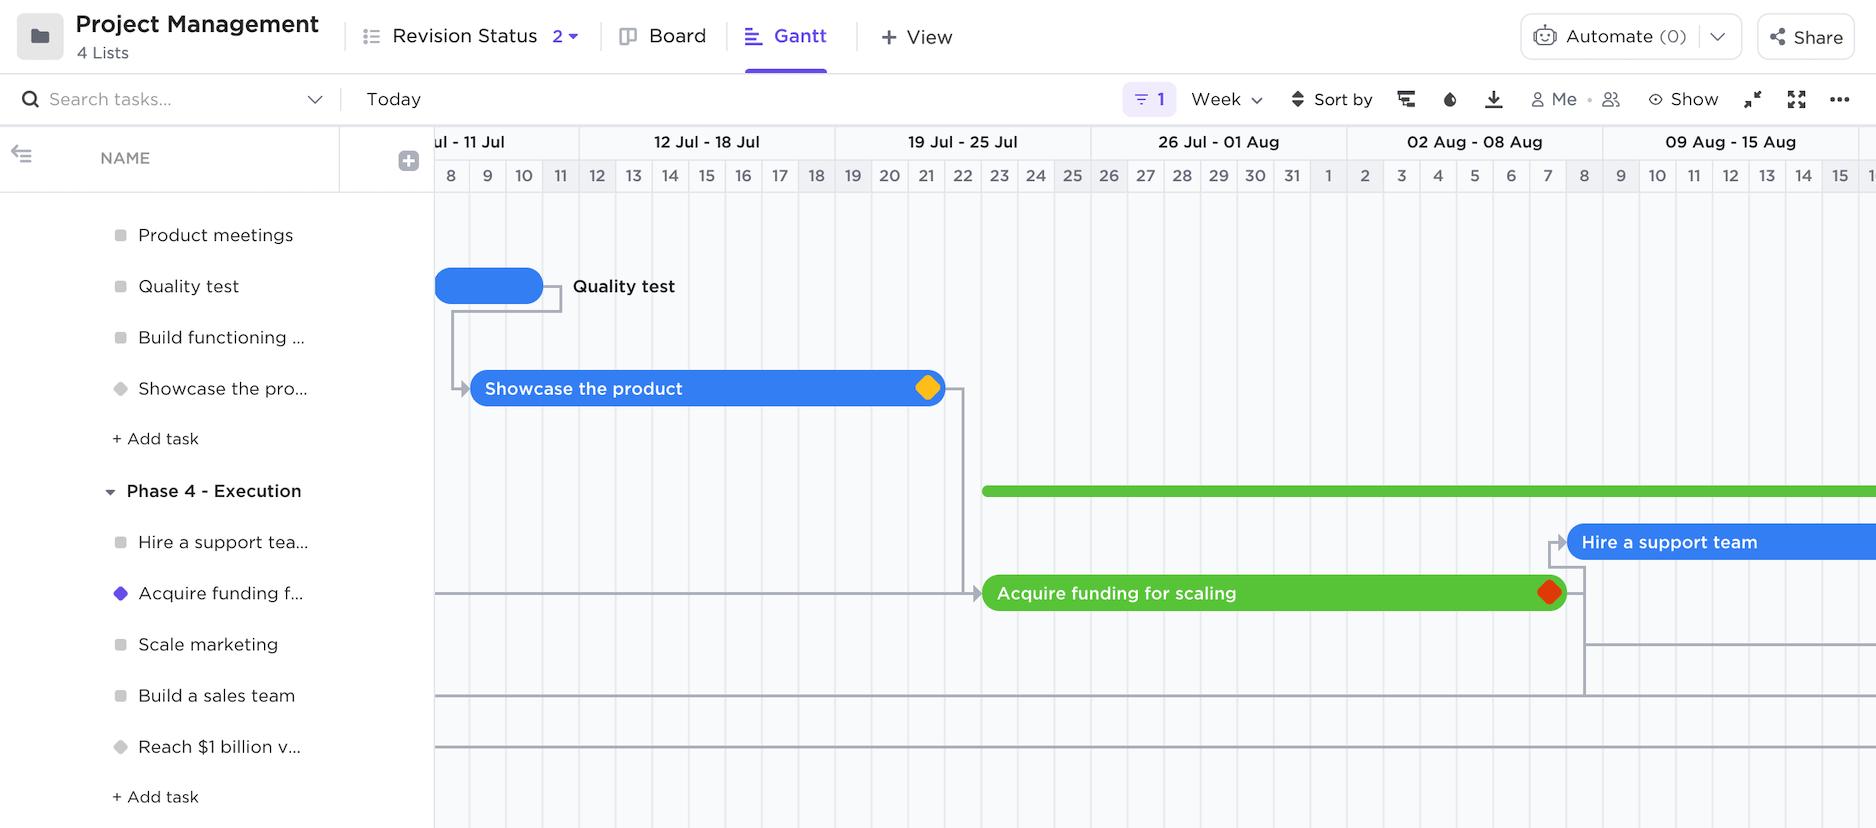 Project Management template Gantt view